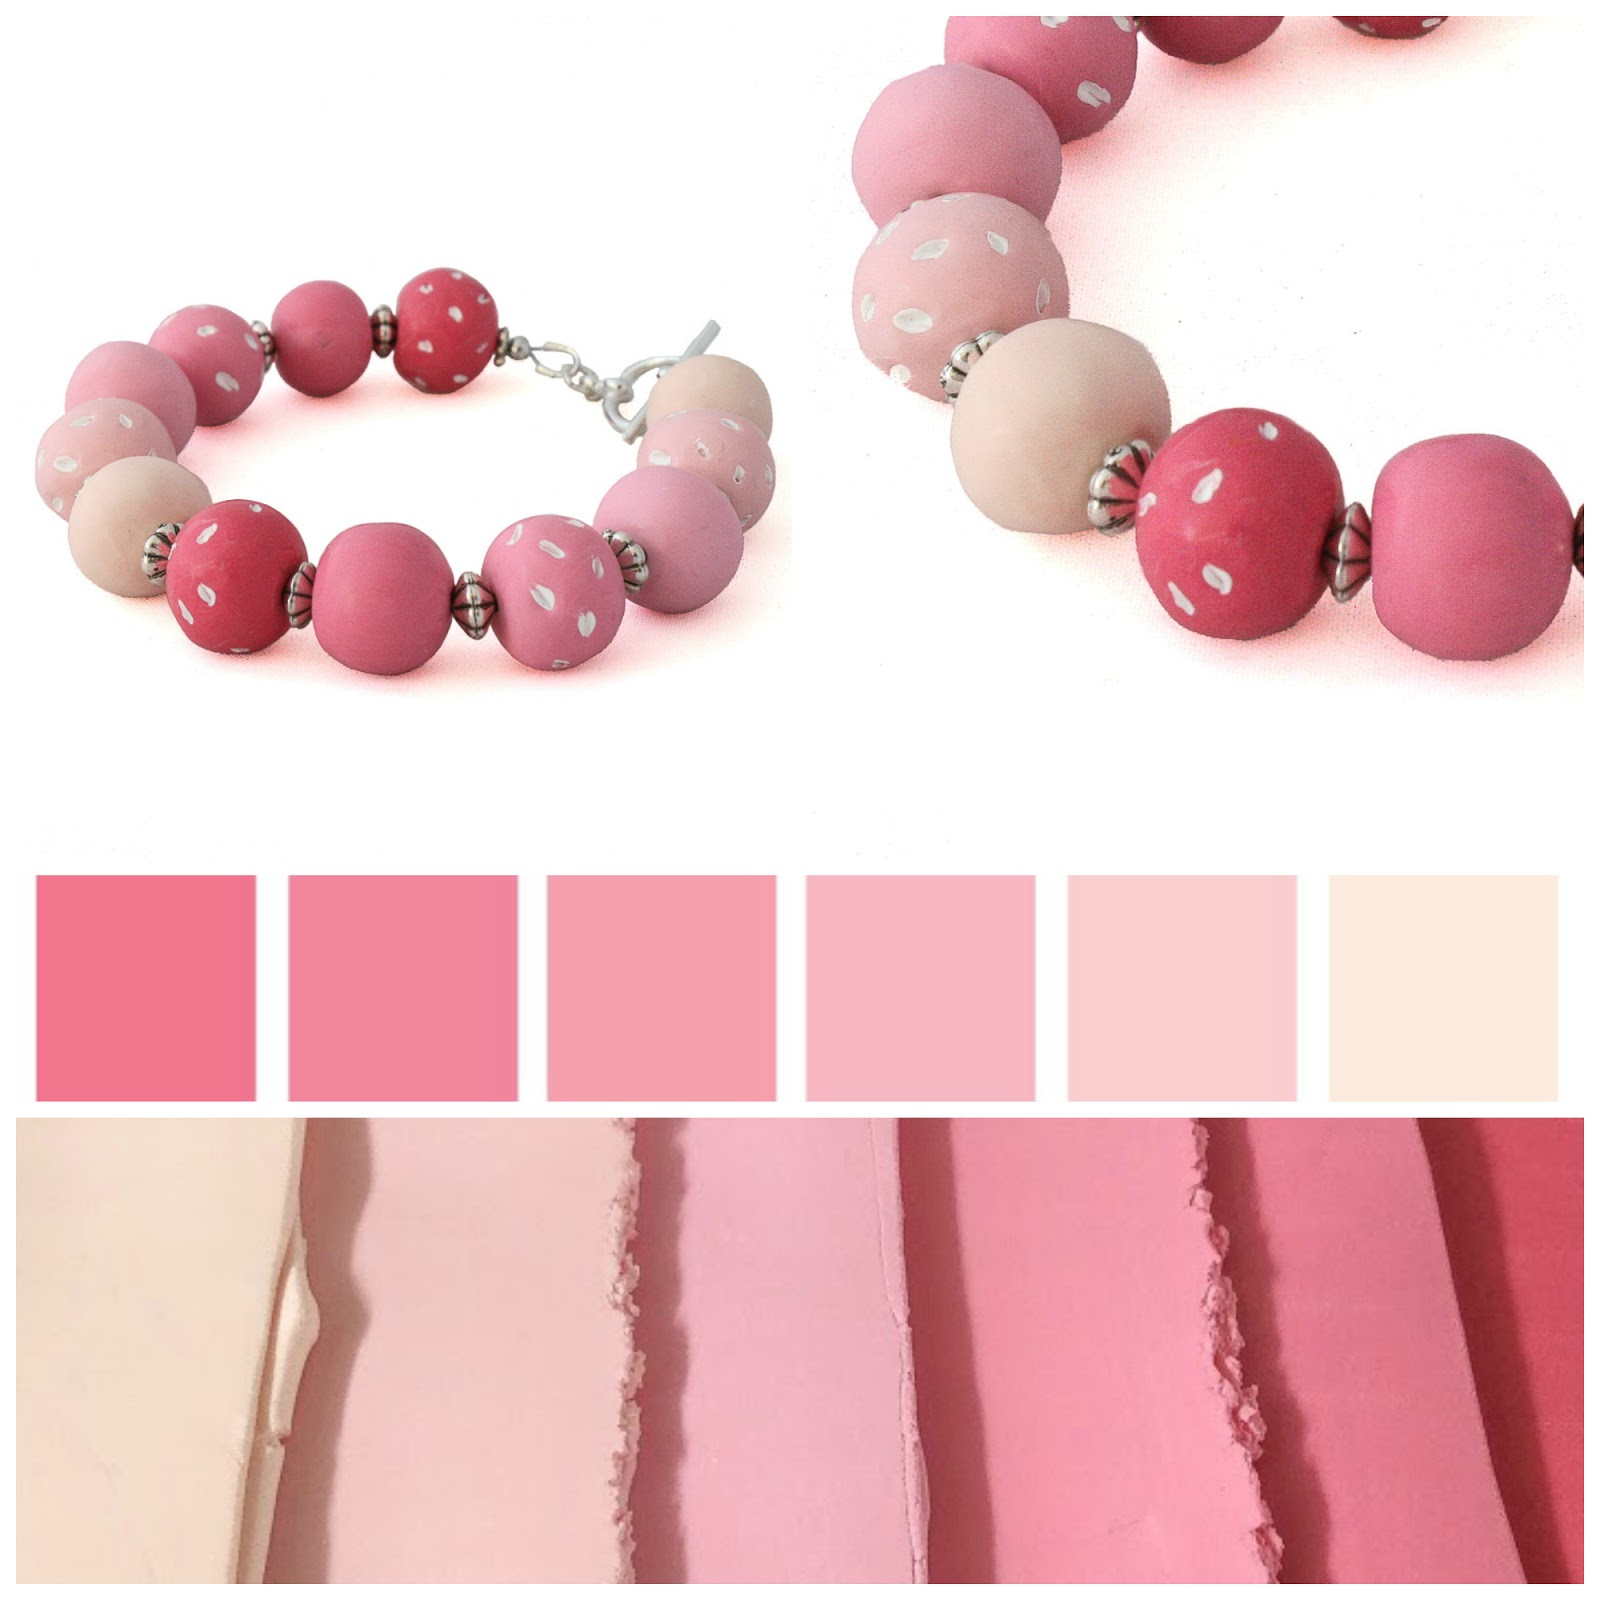 Our lovers pink bracelet - 3 part 4